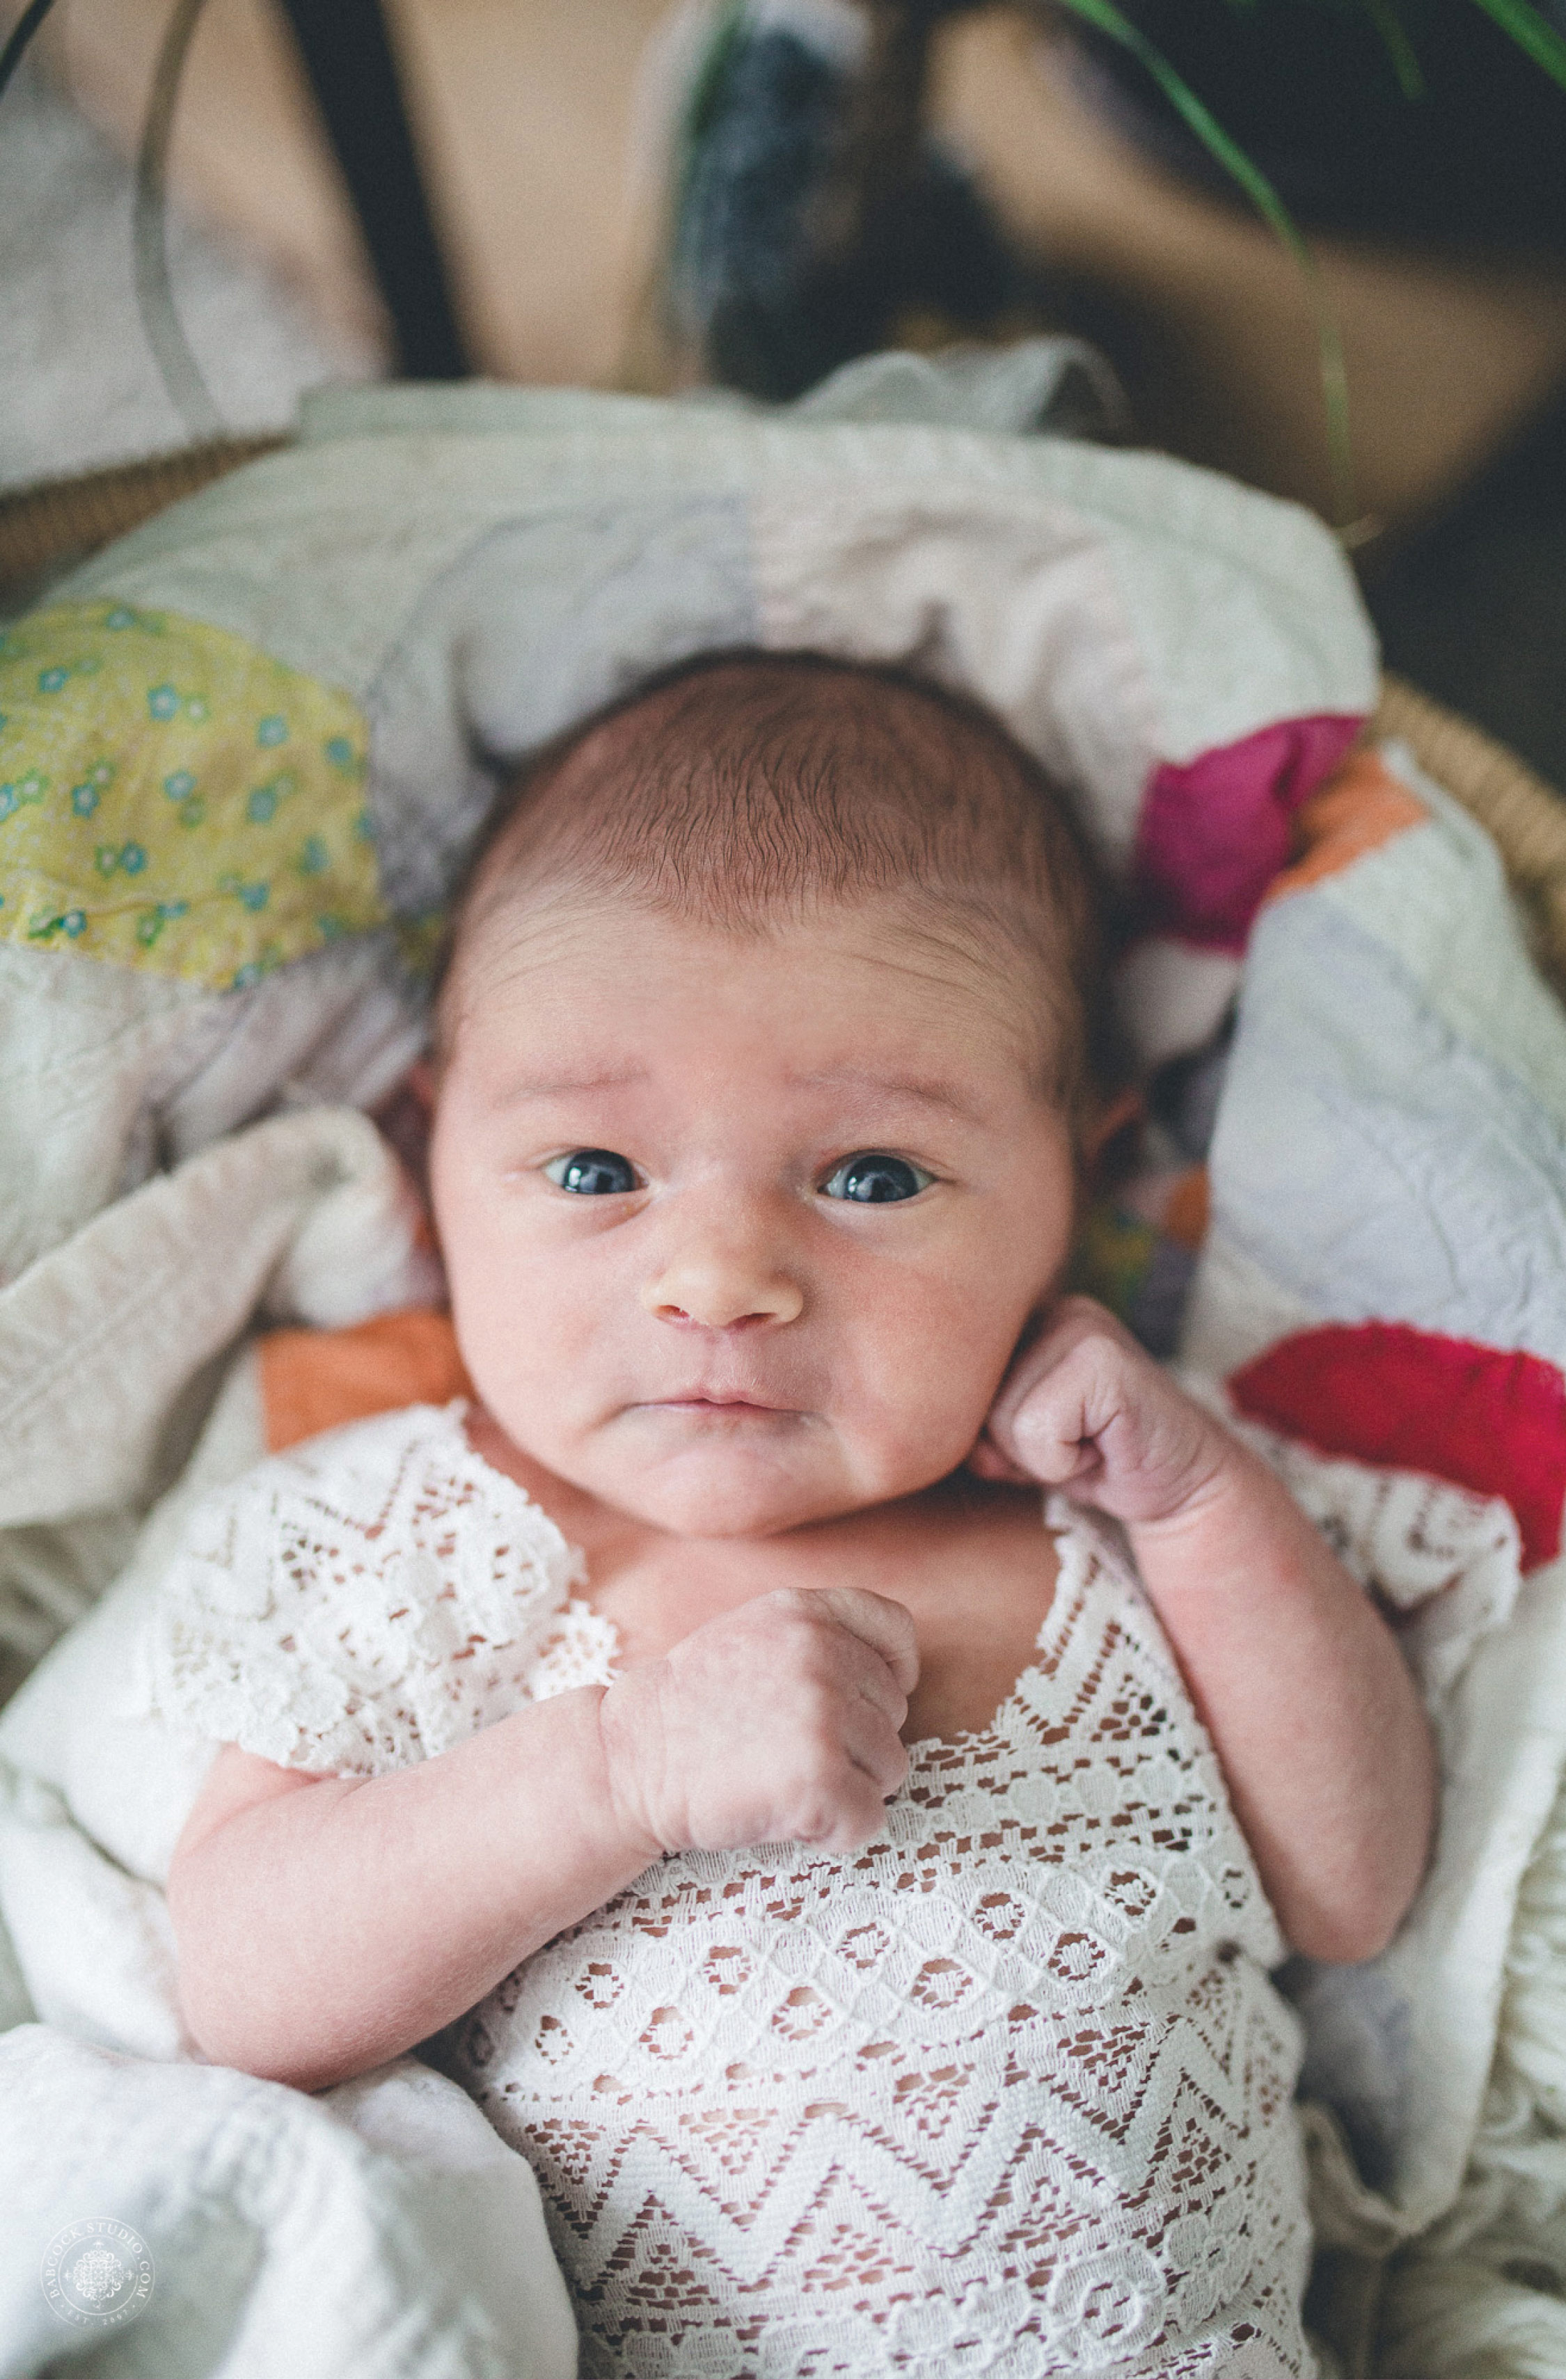 gough-newborn-baby-photographer-dayton-ohio-4.jpg